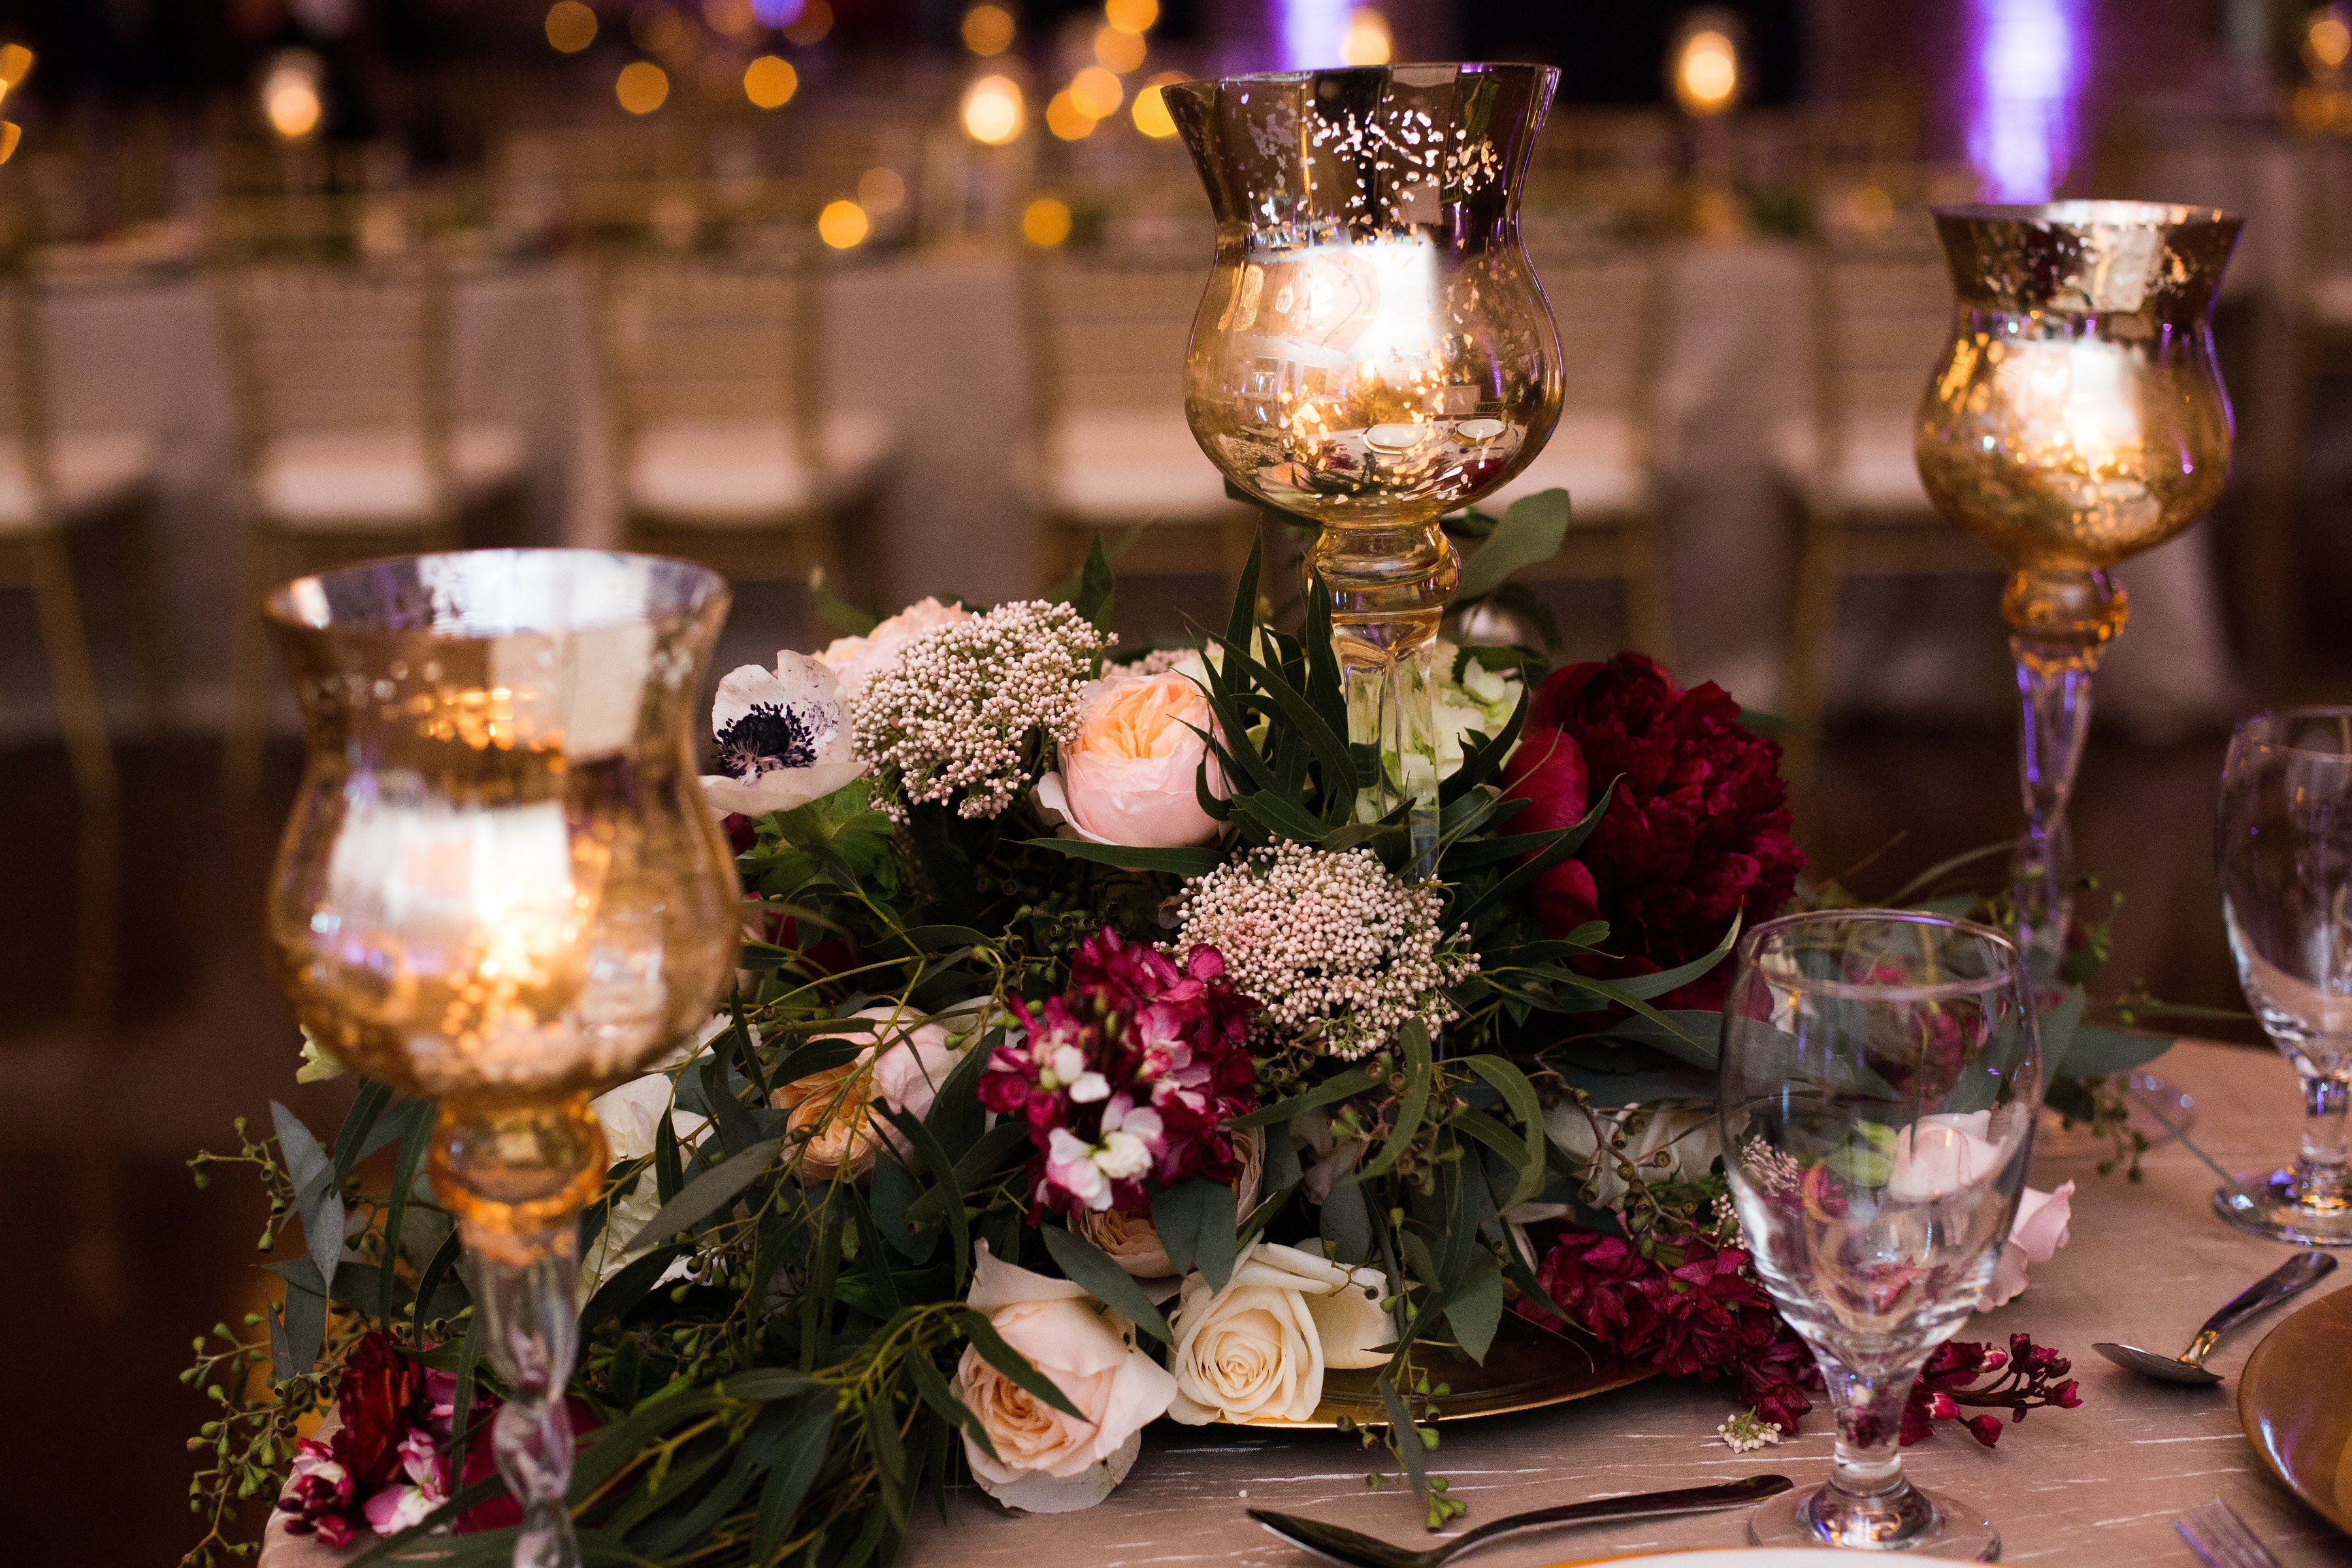 charles-morris-wedding-photo-mg(777).jpg